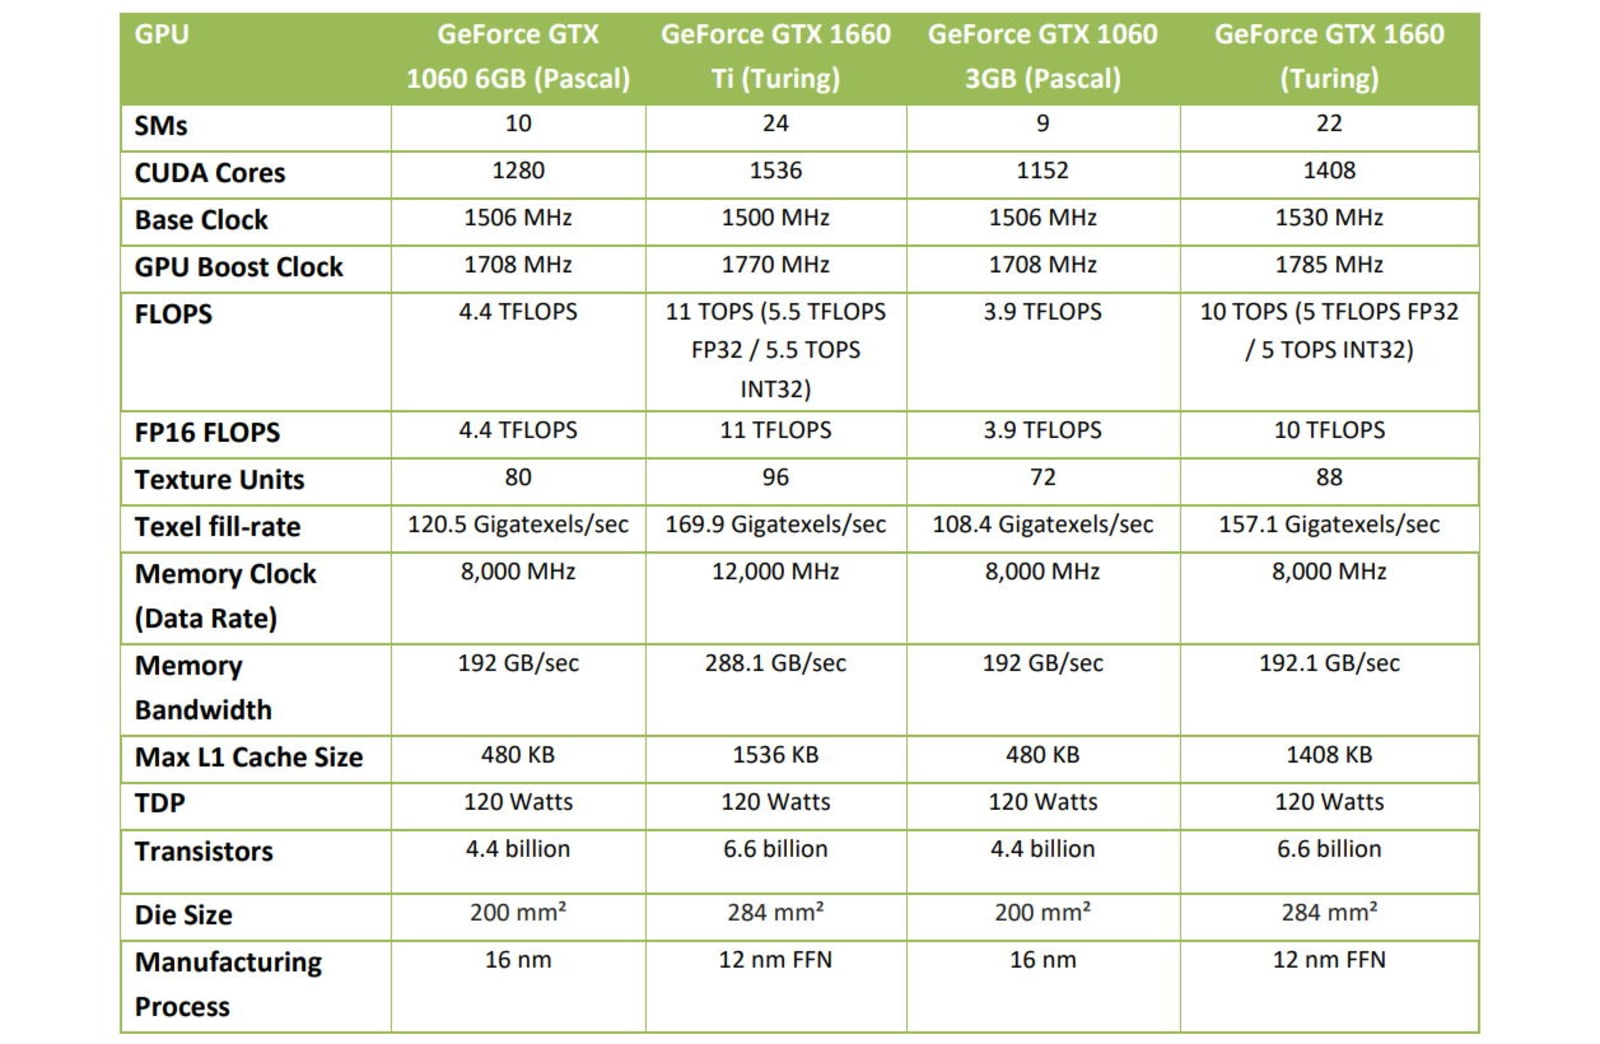 Gigabyte GeForce GTX 1660 GPU